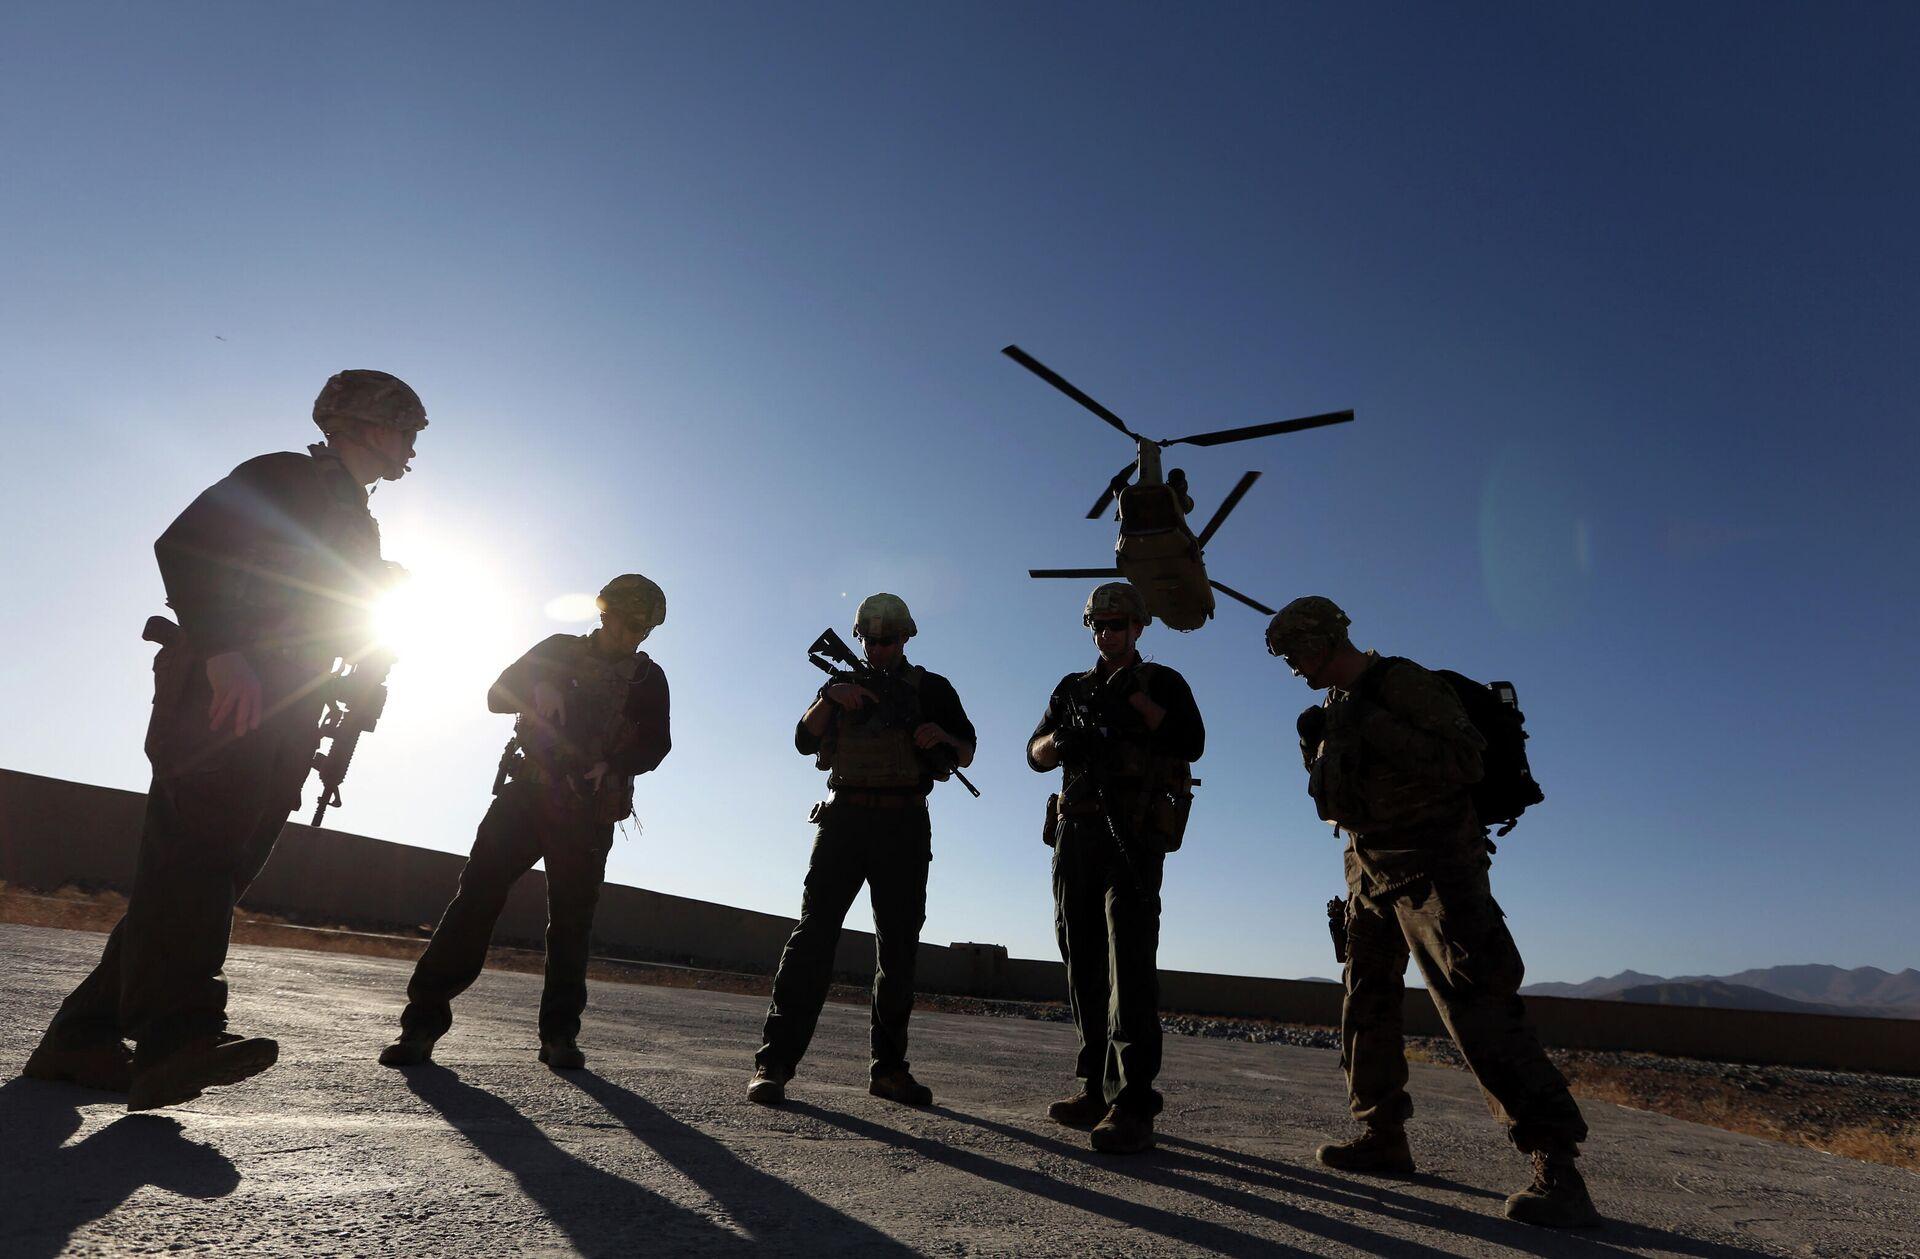 Американские солдаты в провинции Логар, Афганистан. - РИА Новости, 1920, 06.04.2021